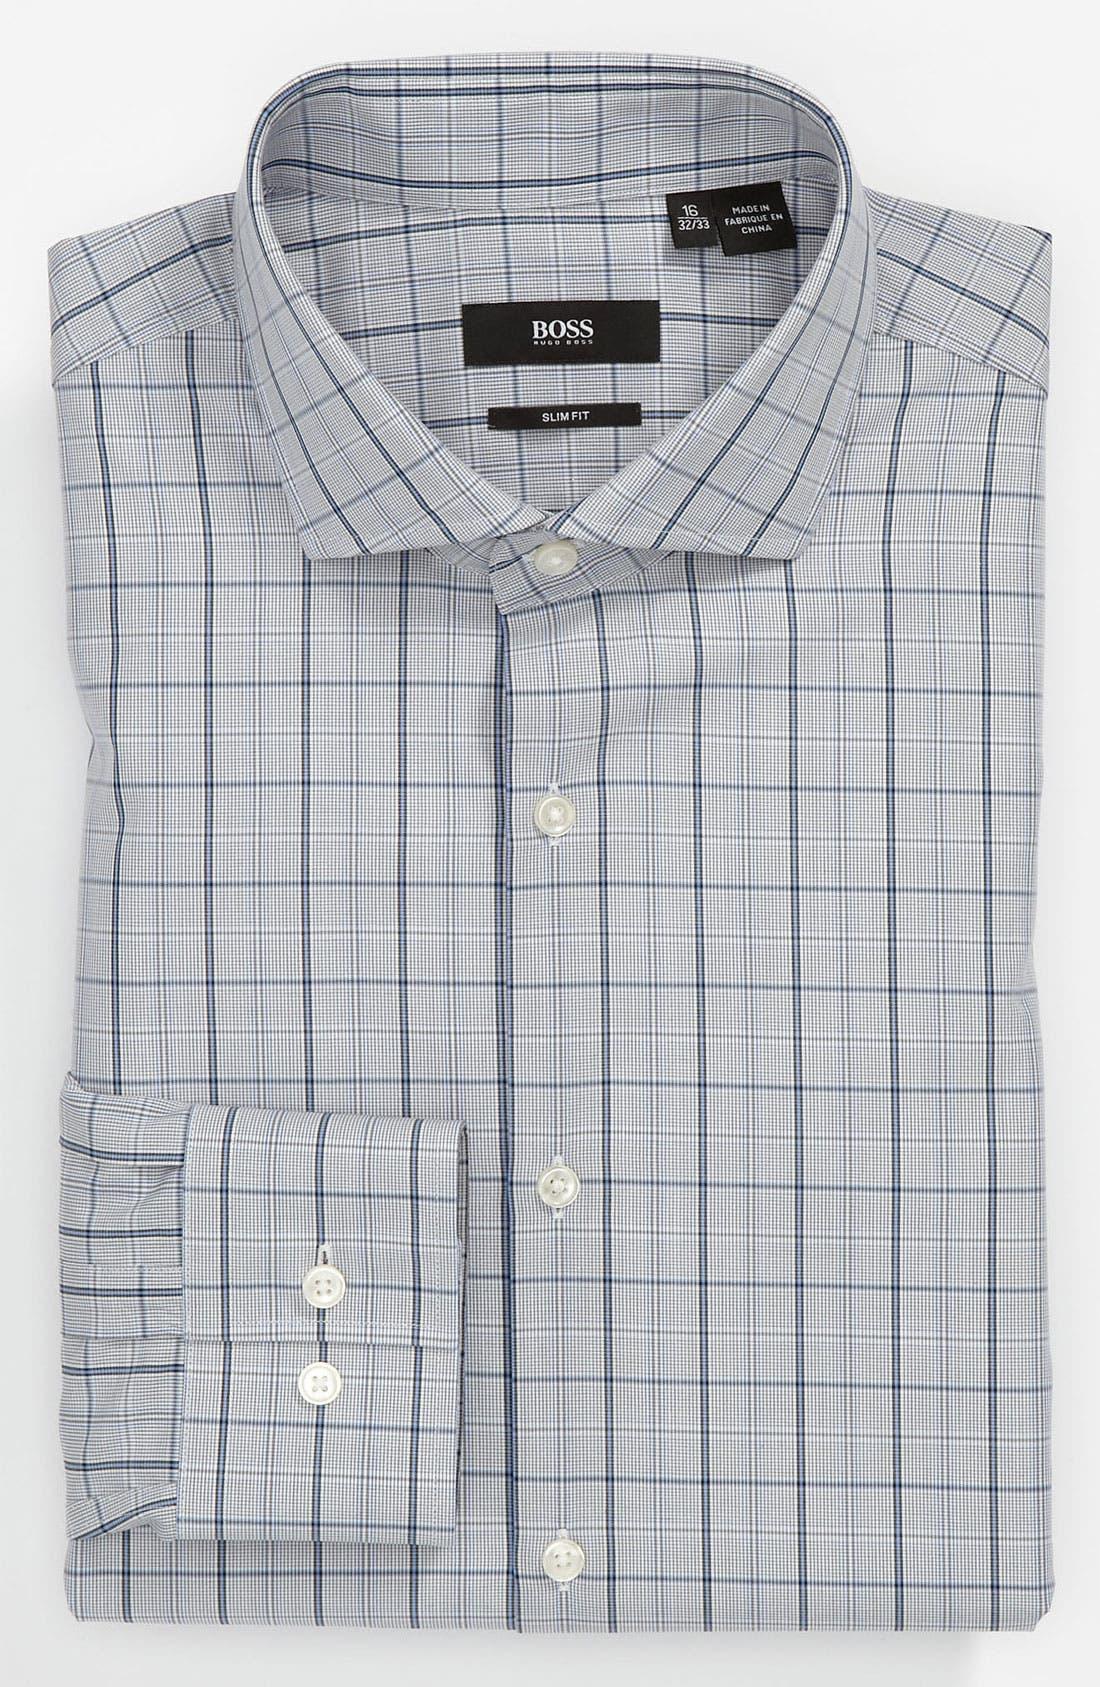 Black Slim Fit Dress Shirt,                         Main,                         color, Blue